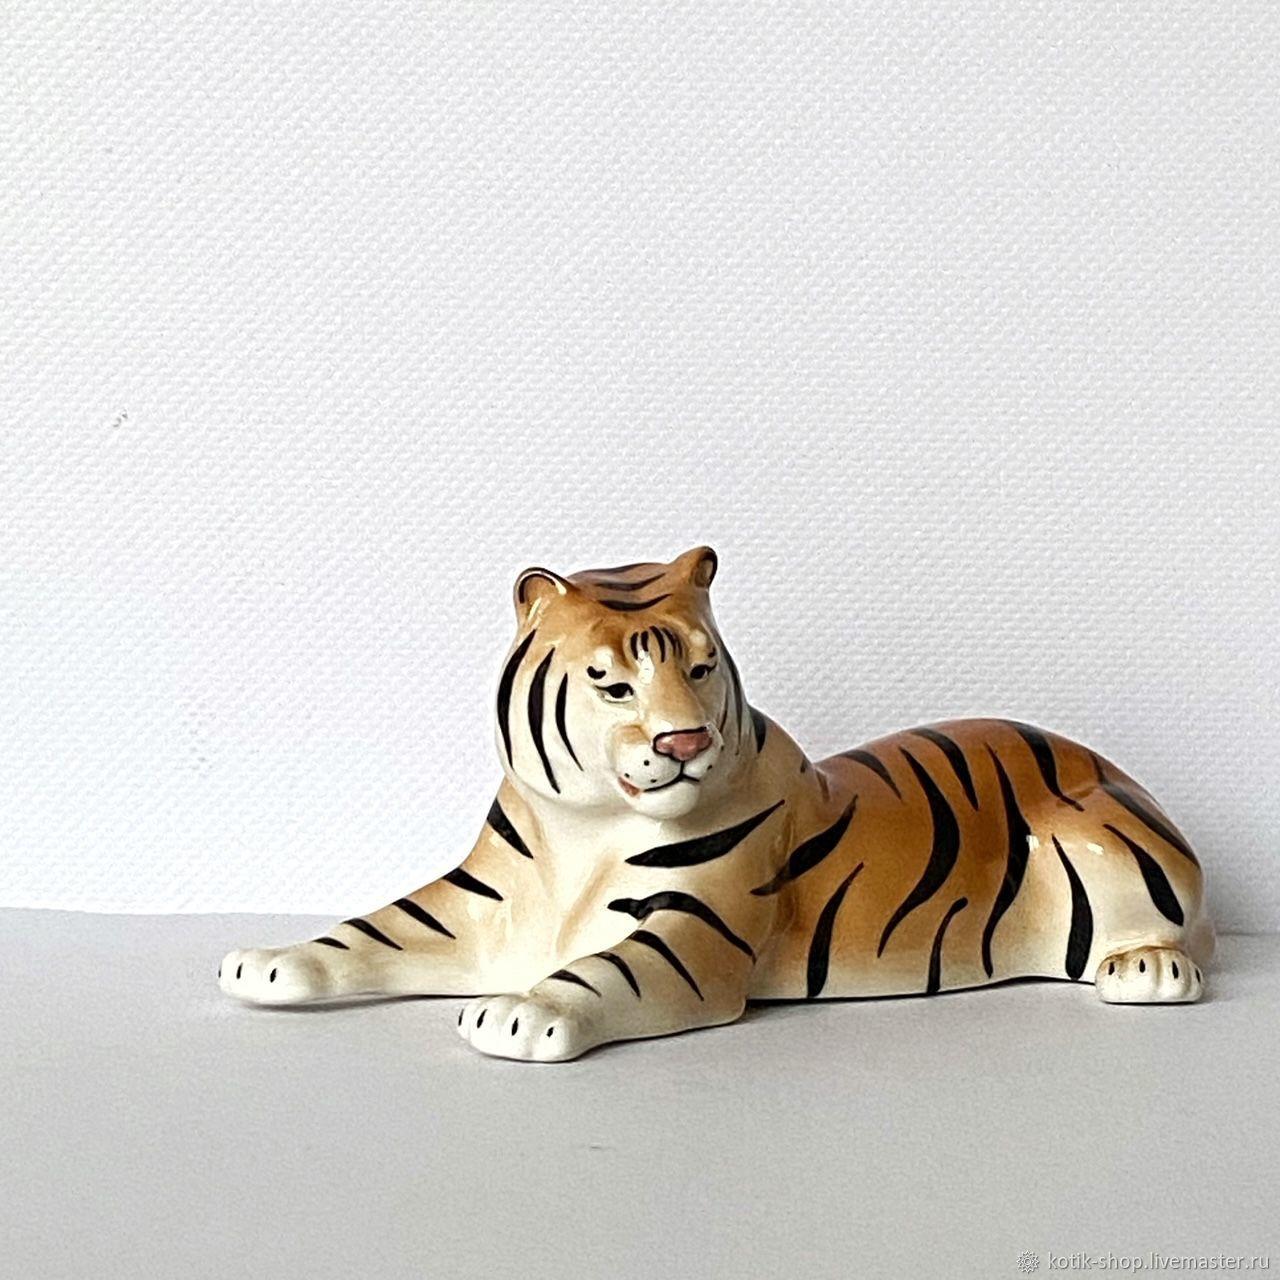 Статуэтка тигр, Статуэтки, Москва,  Фото №1